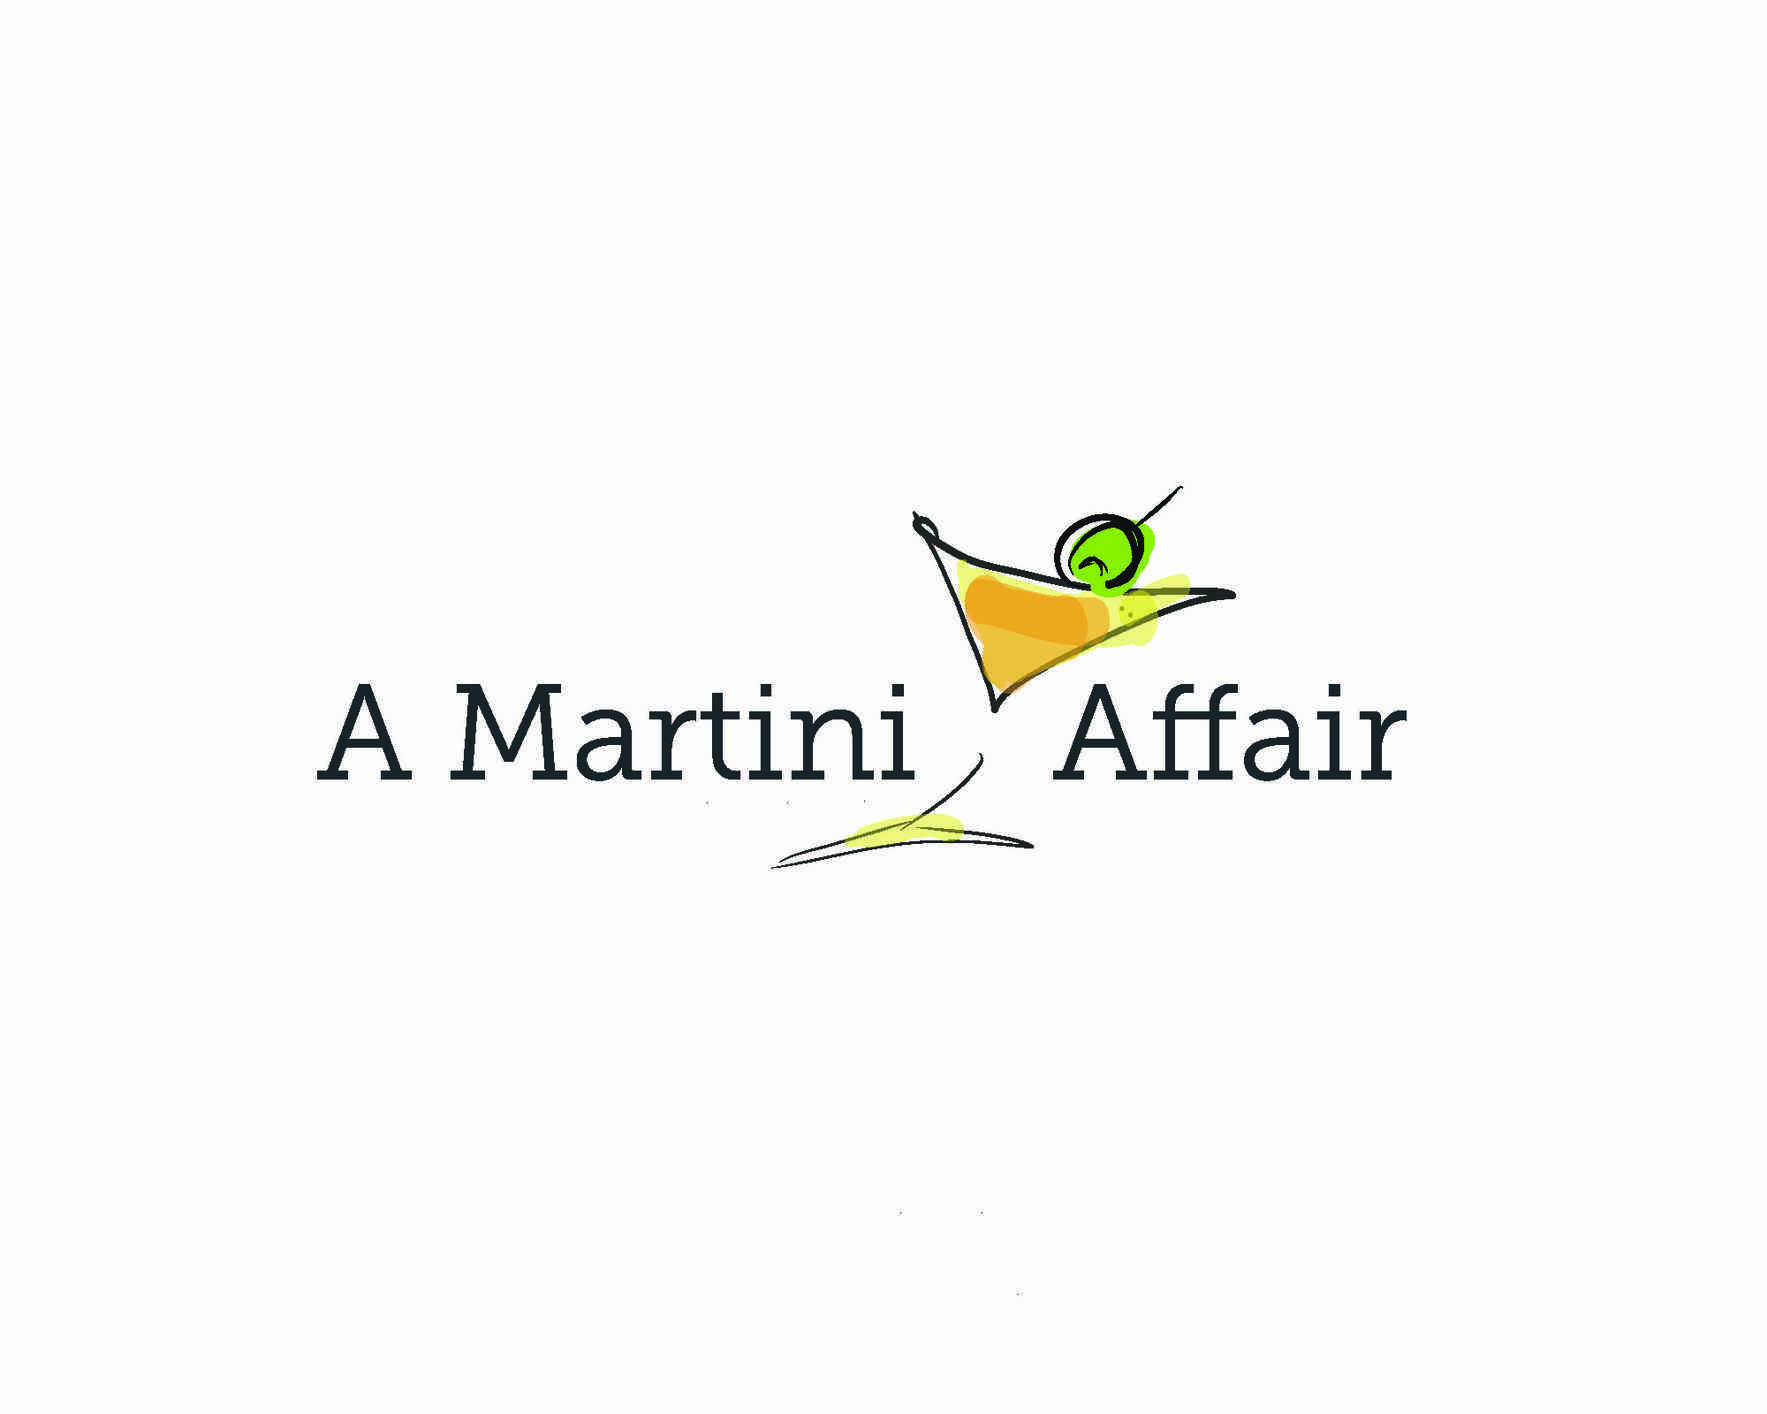 A Martini Affair 2020 image